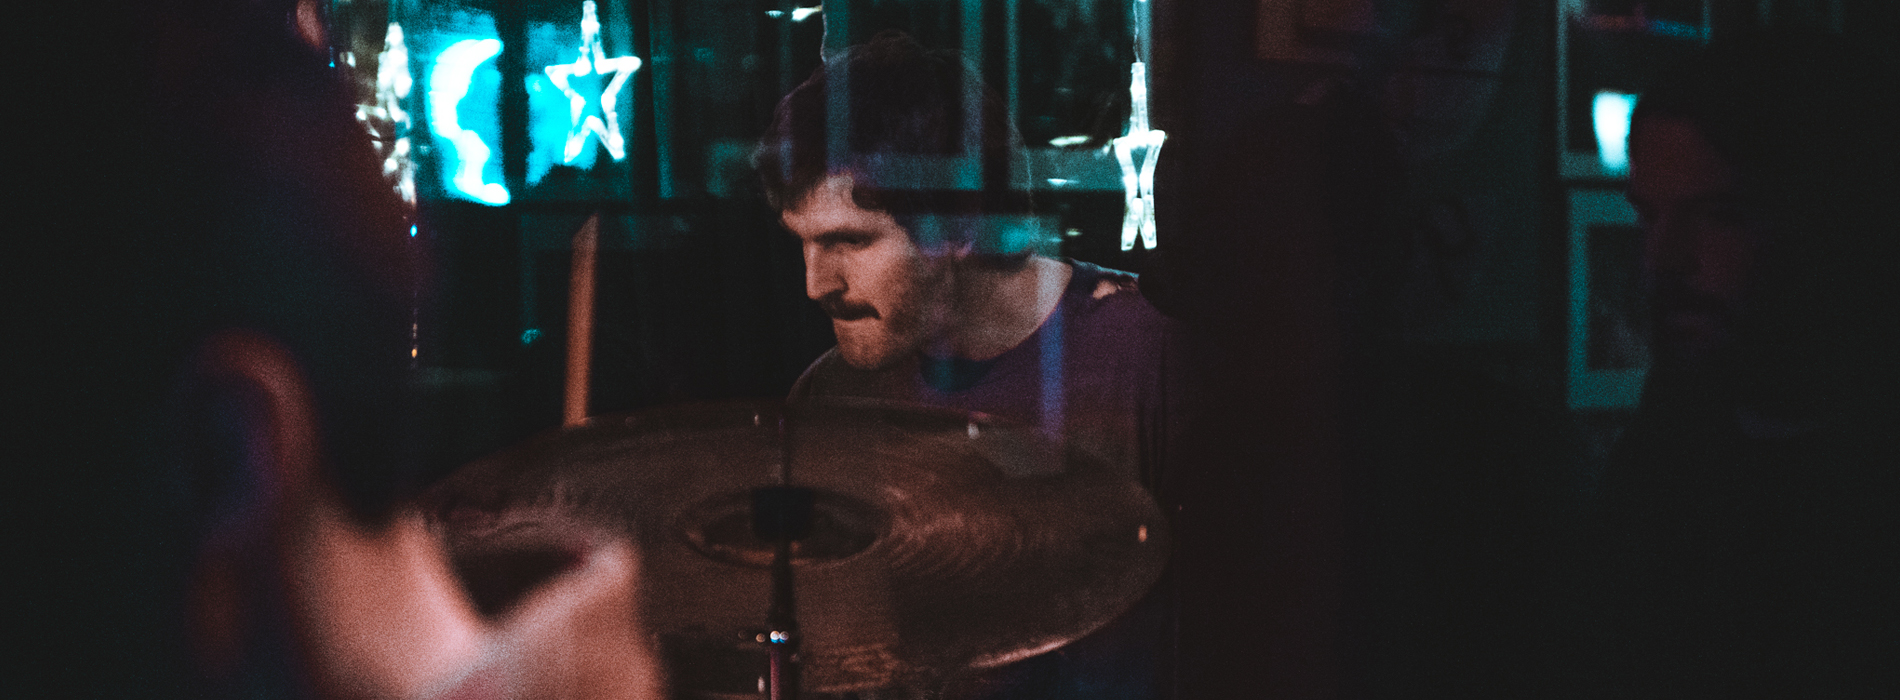 carousel drum image